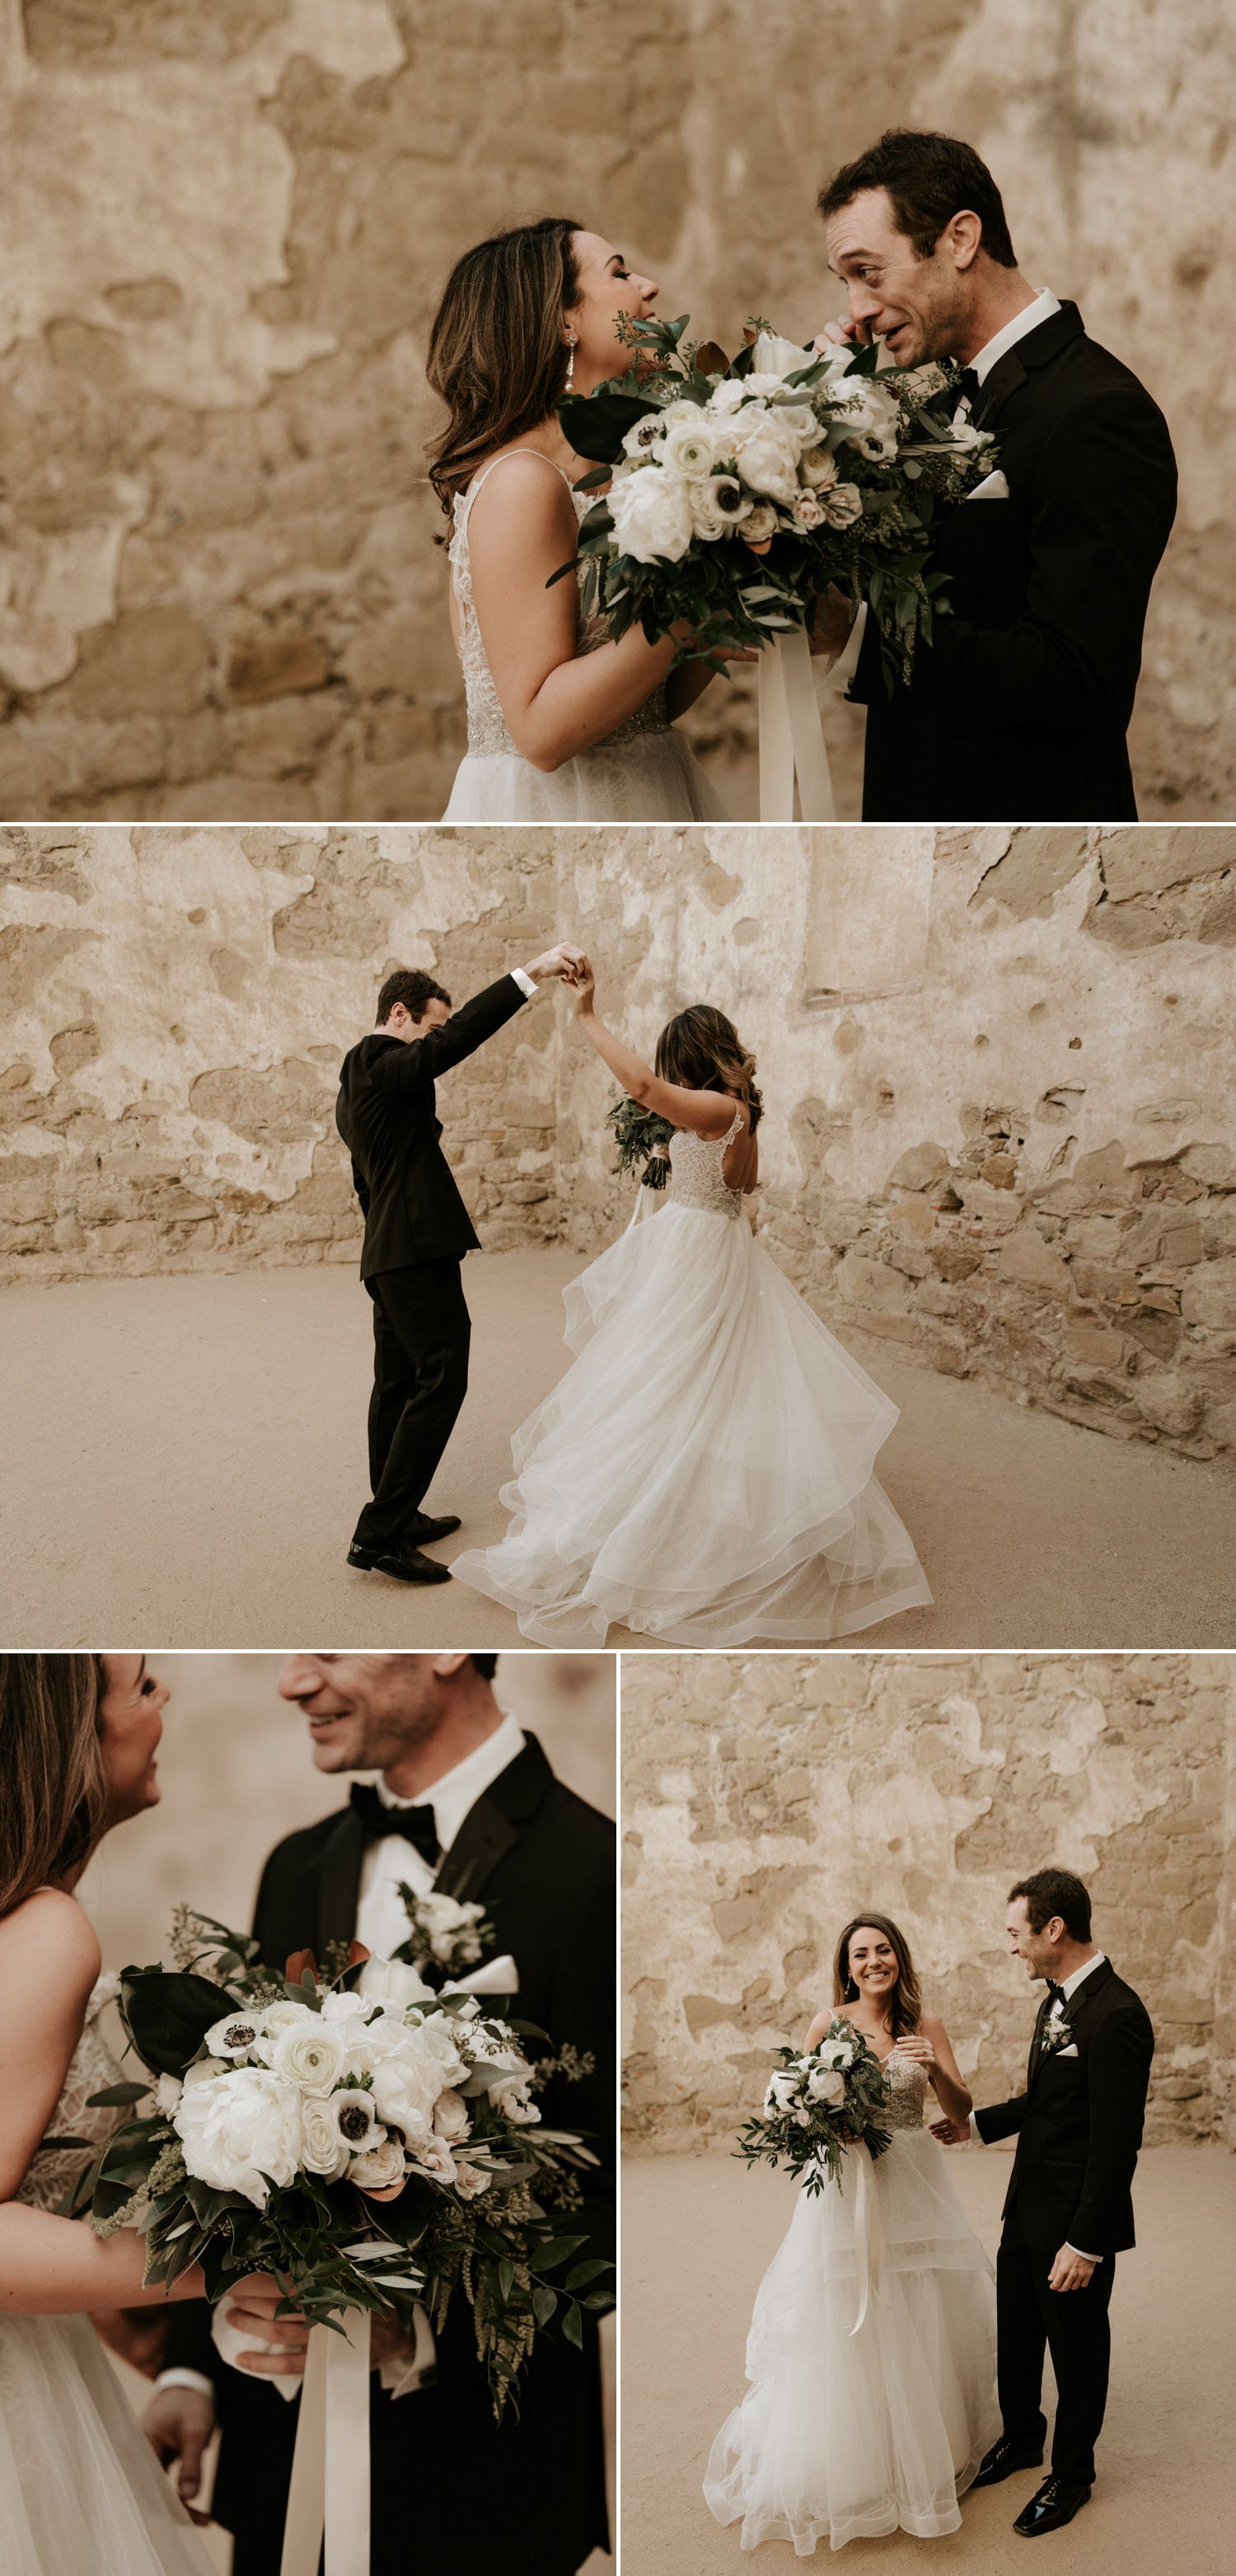 Mission San Juan Capistrano wedding Paige Nelson